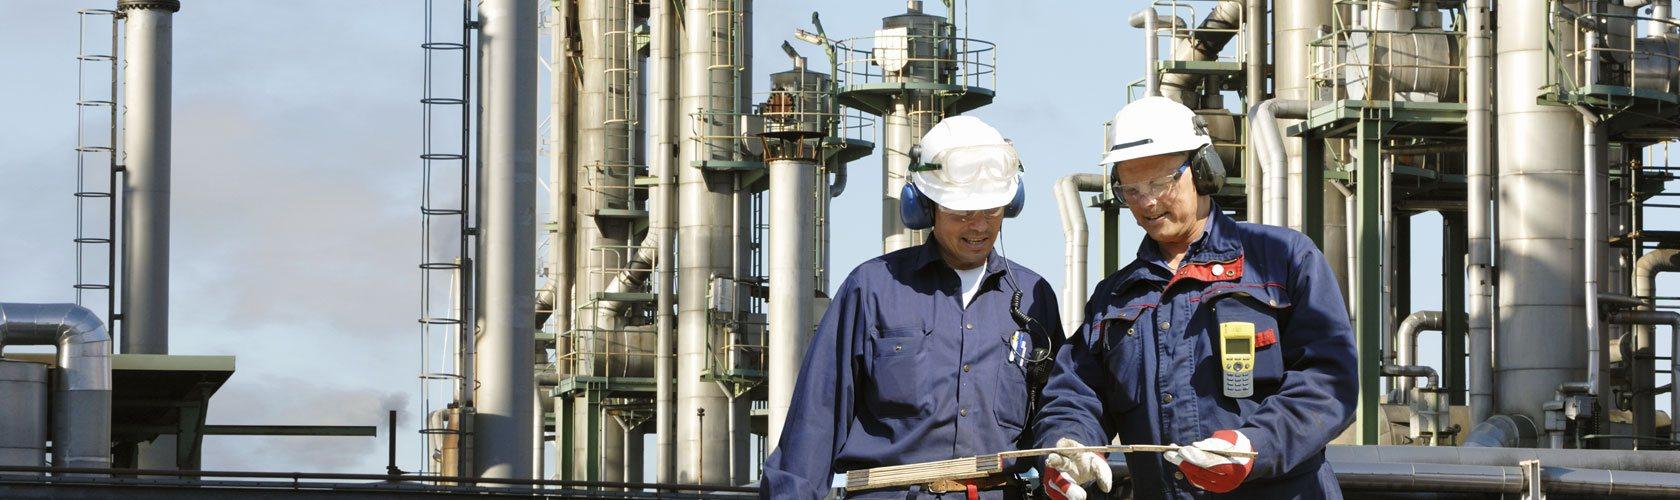 kinetic plc job search engineering jobs